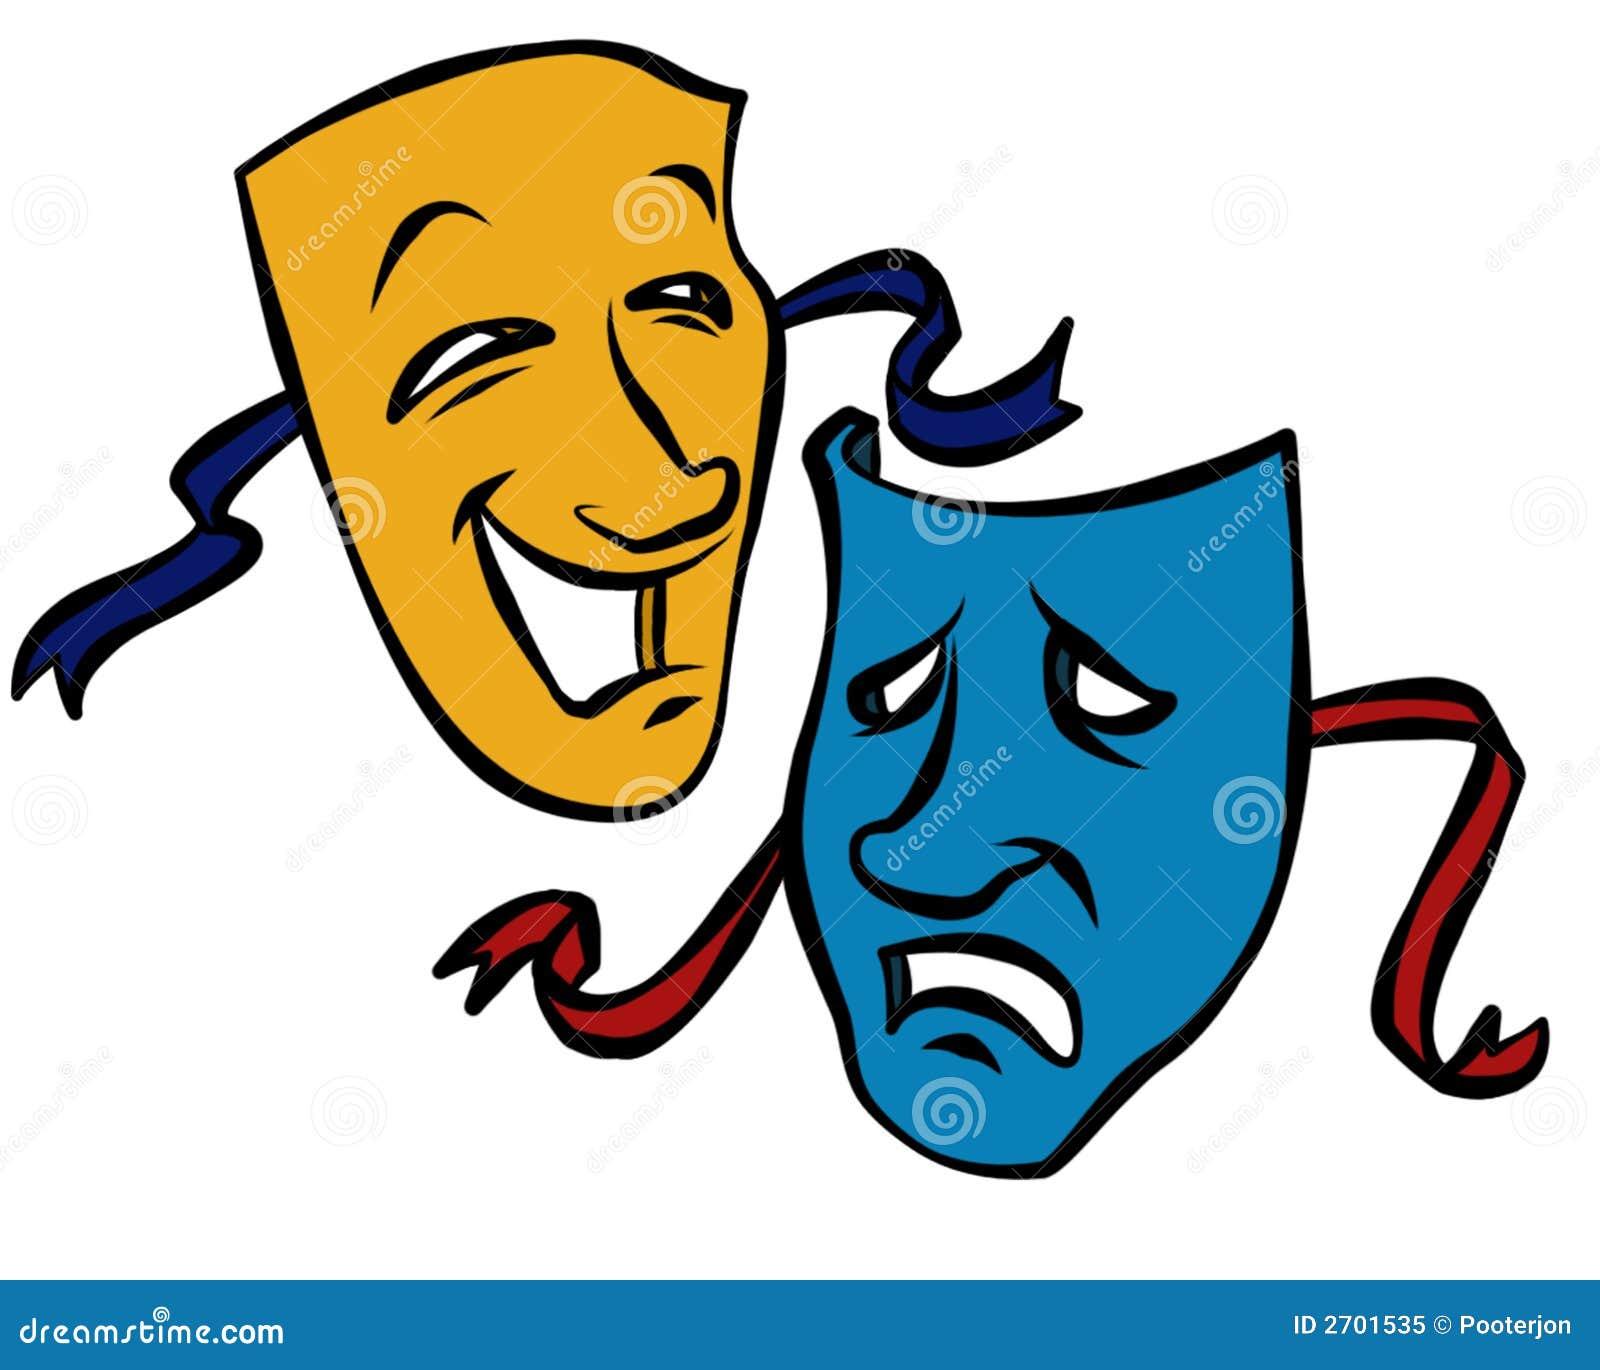 drama masks stock illustration illustration of ribbons Drama Clip Art Black and White Drama Clip Art Black and White